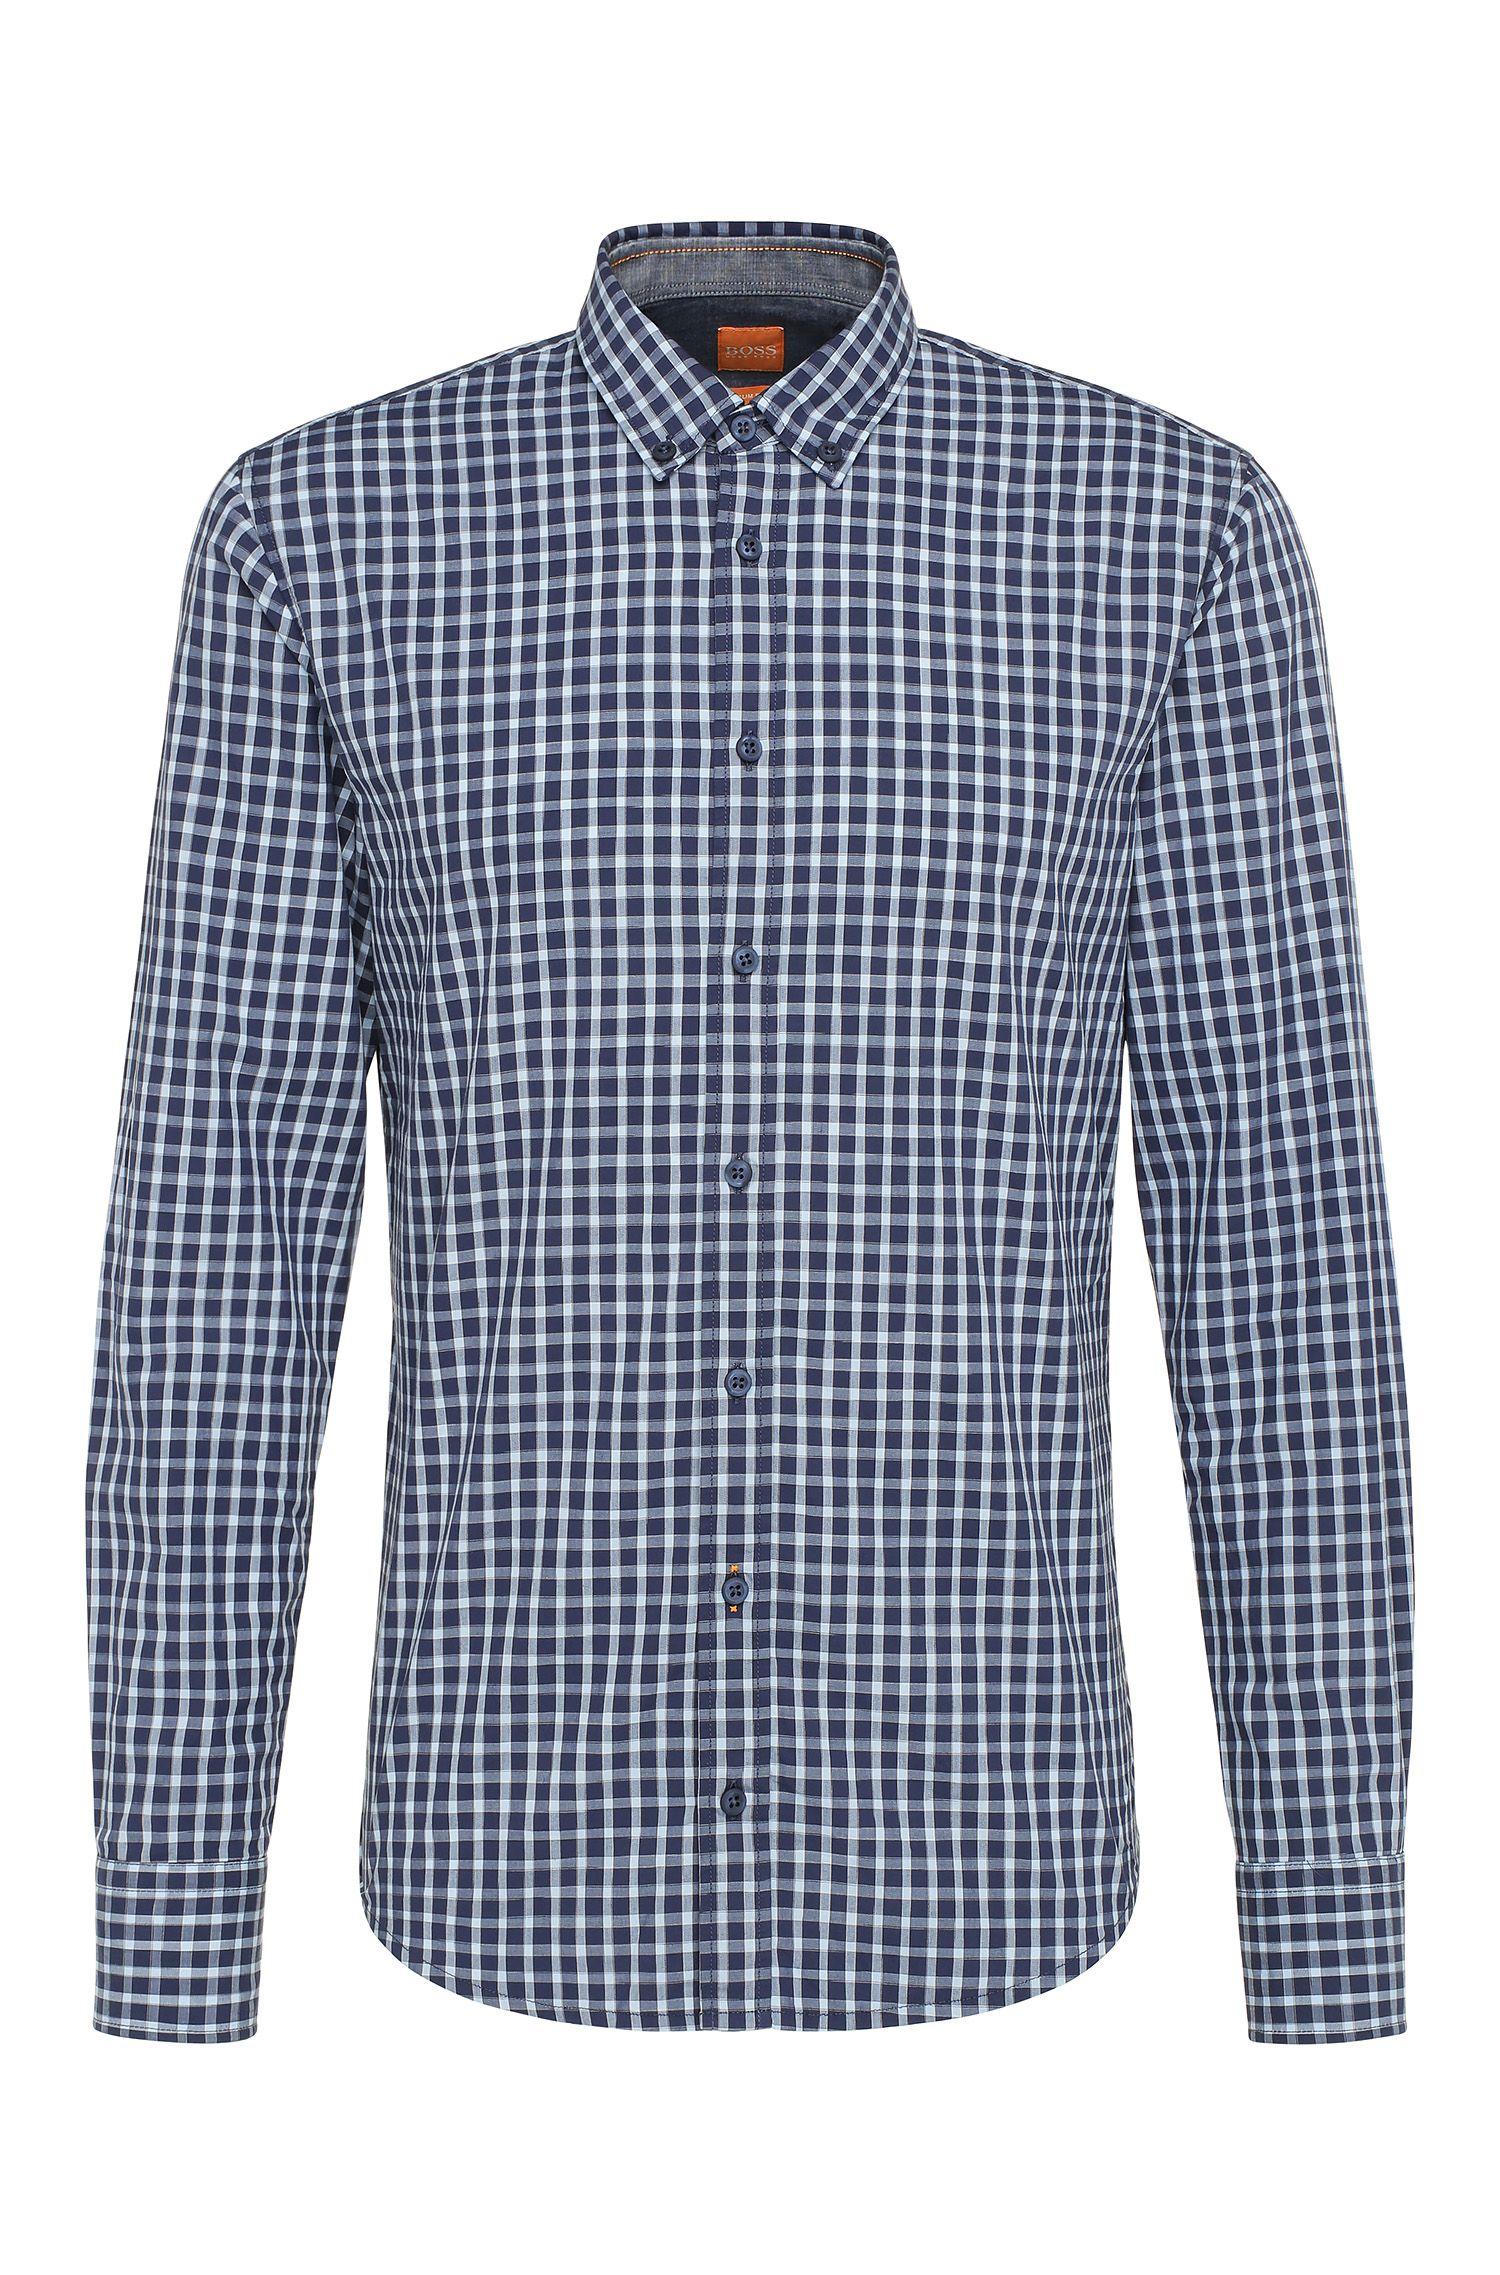 'EdipoE' | Slim Fit, Cotton Plaid Button Down Shirt